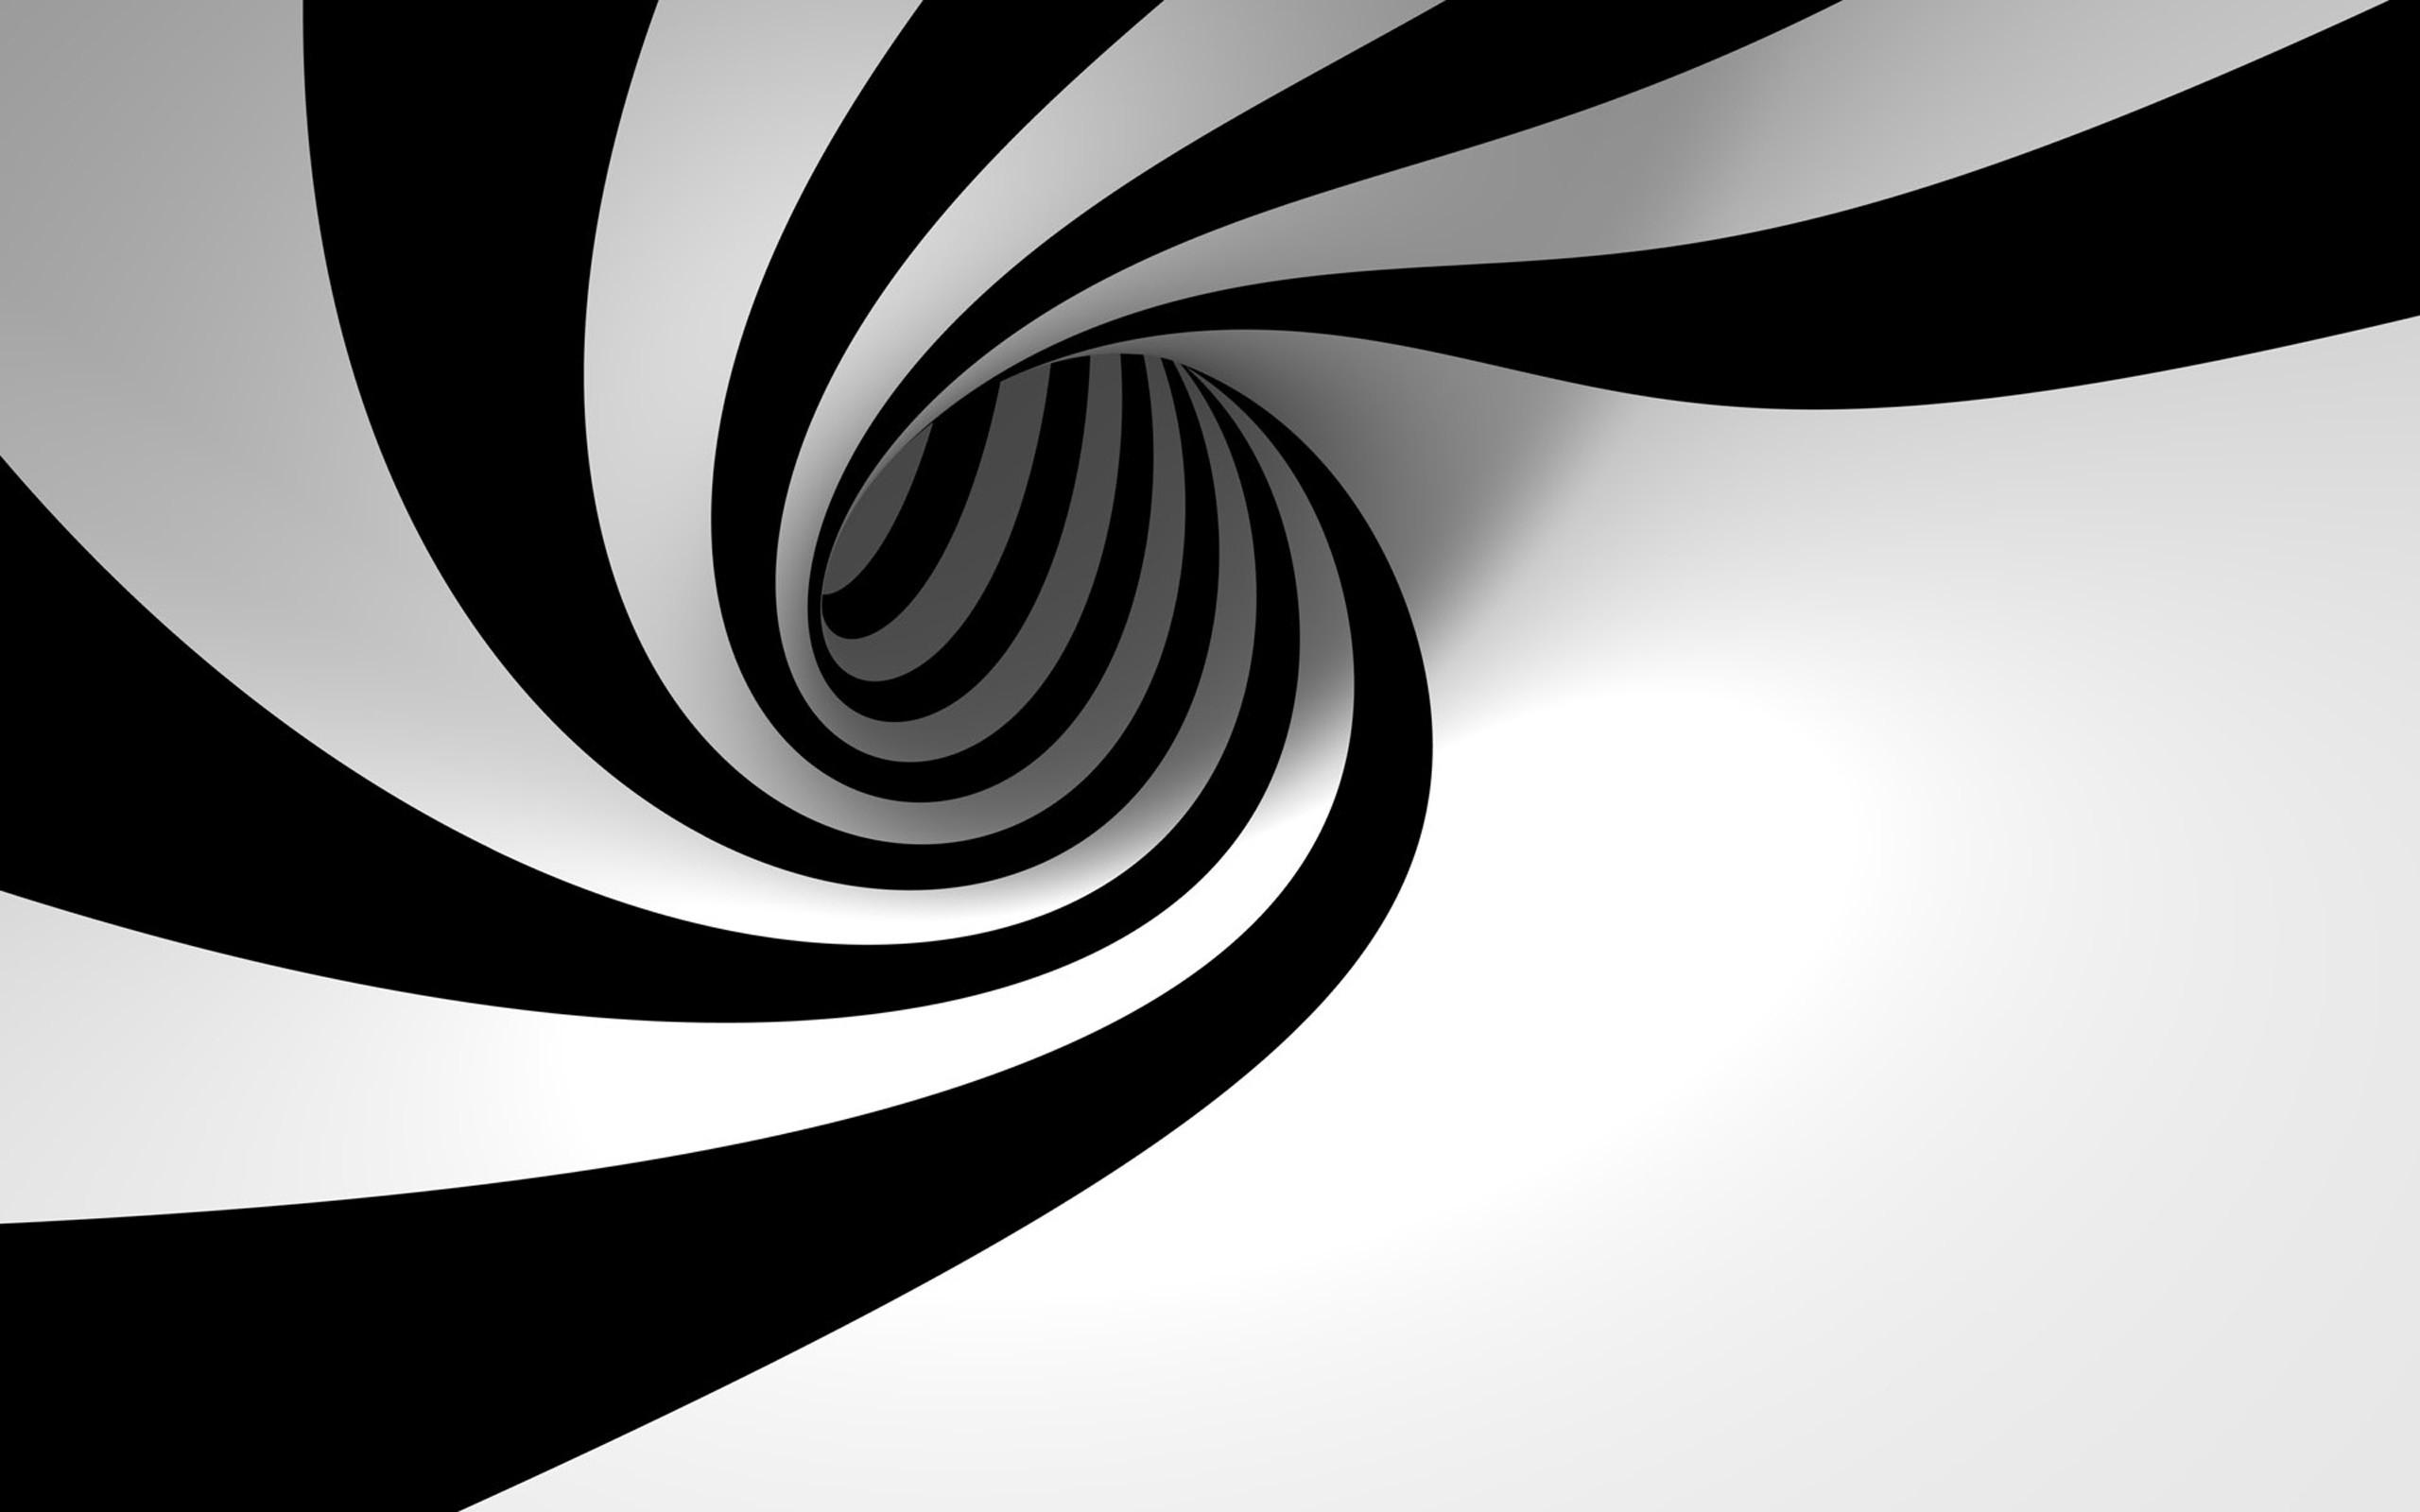 HYpnotizing Spiral Black And White Wallpaper